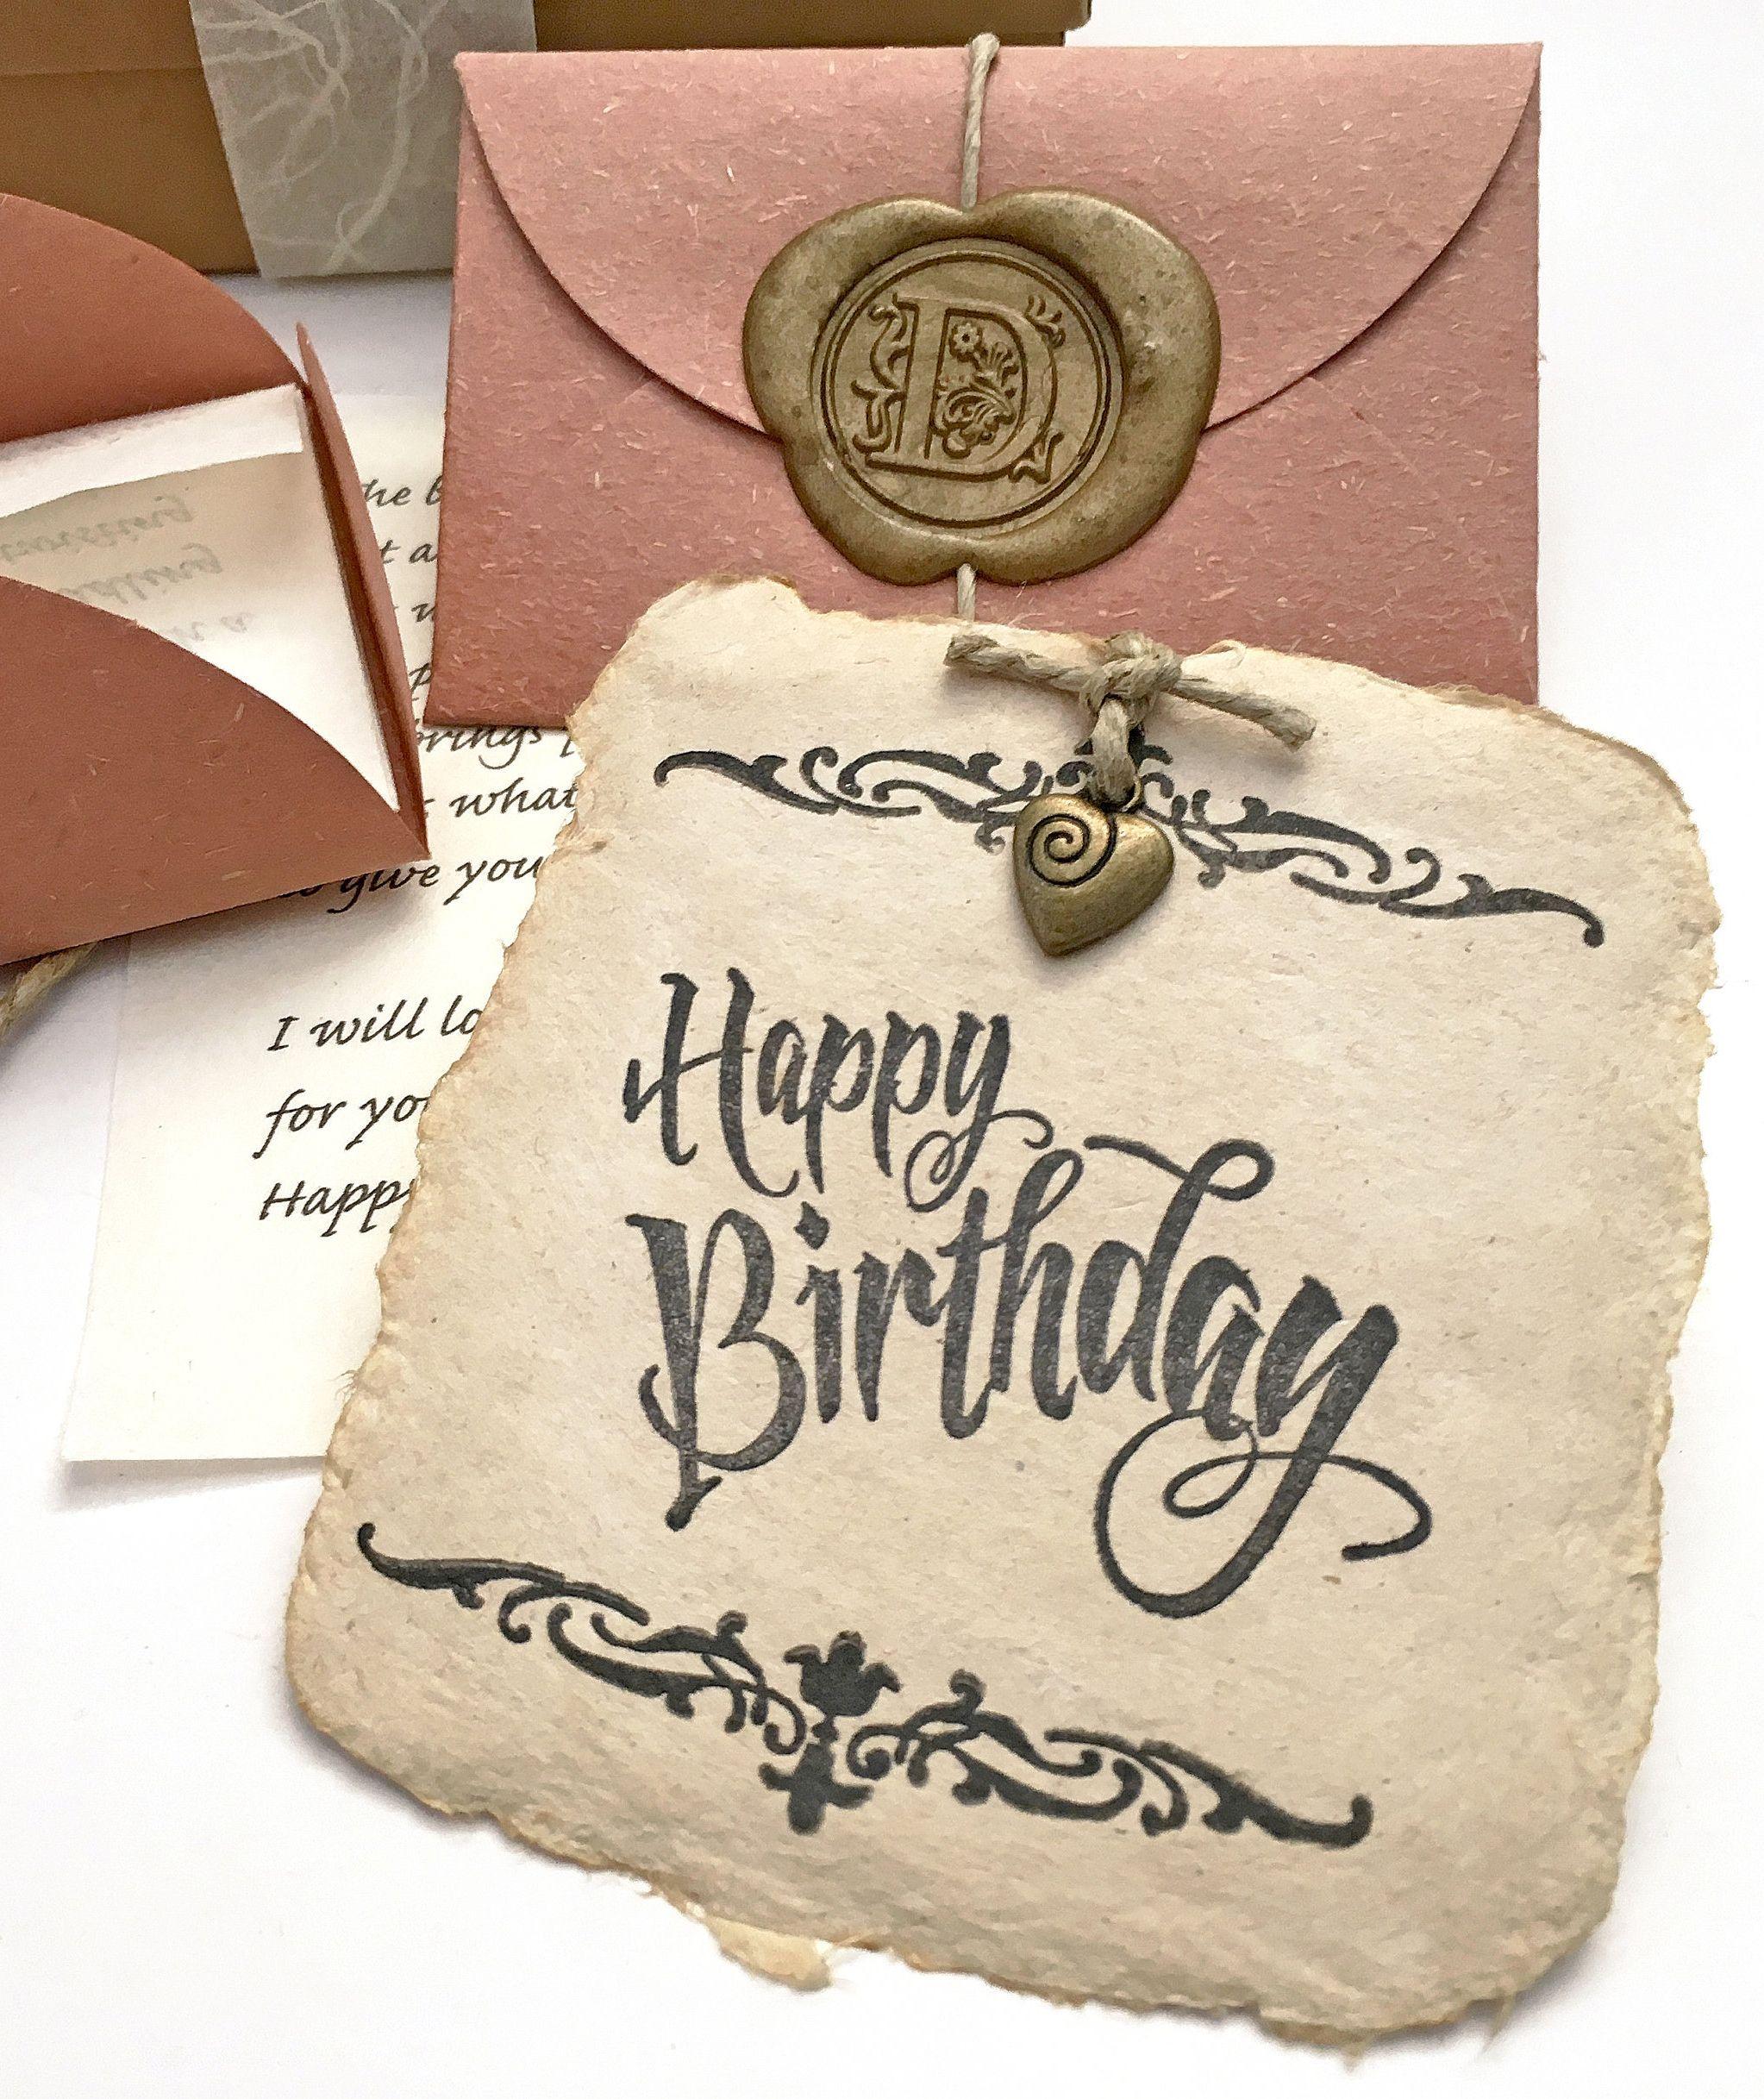 Meaningful Birthday Gift Romanticbirthdaygiftforhusband Birthdaygiftforwife Personalizedletter Uniquebirthdaycard Unusualbirthdaypresent